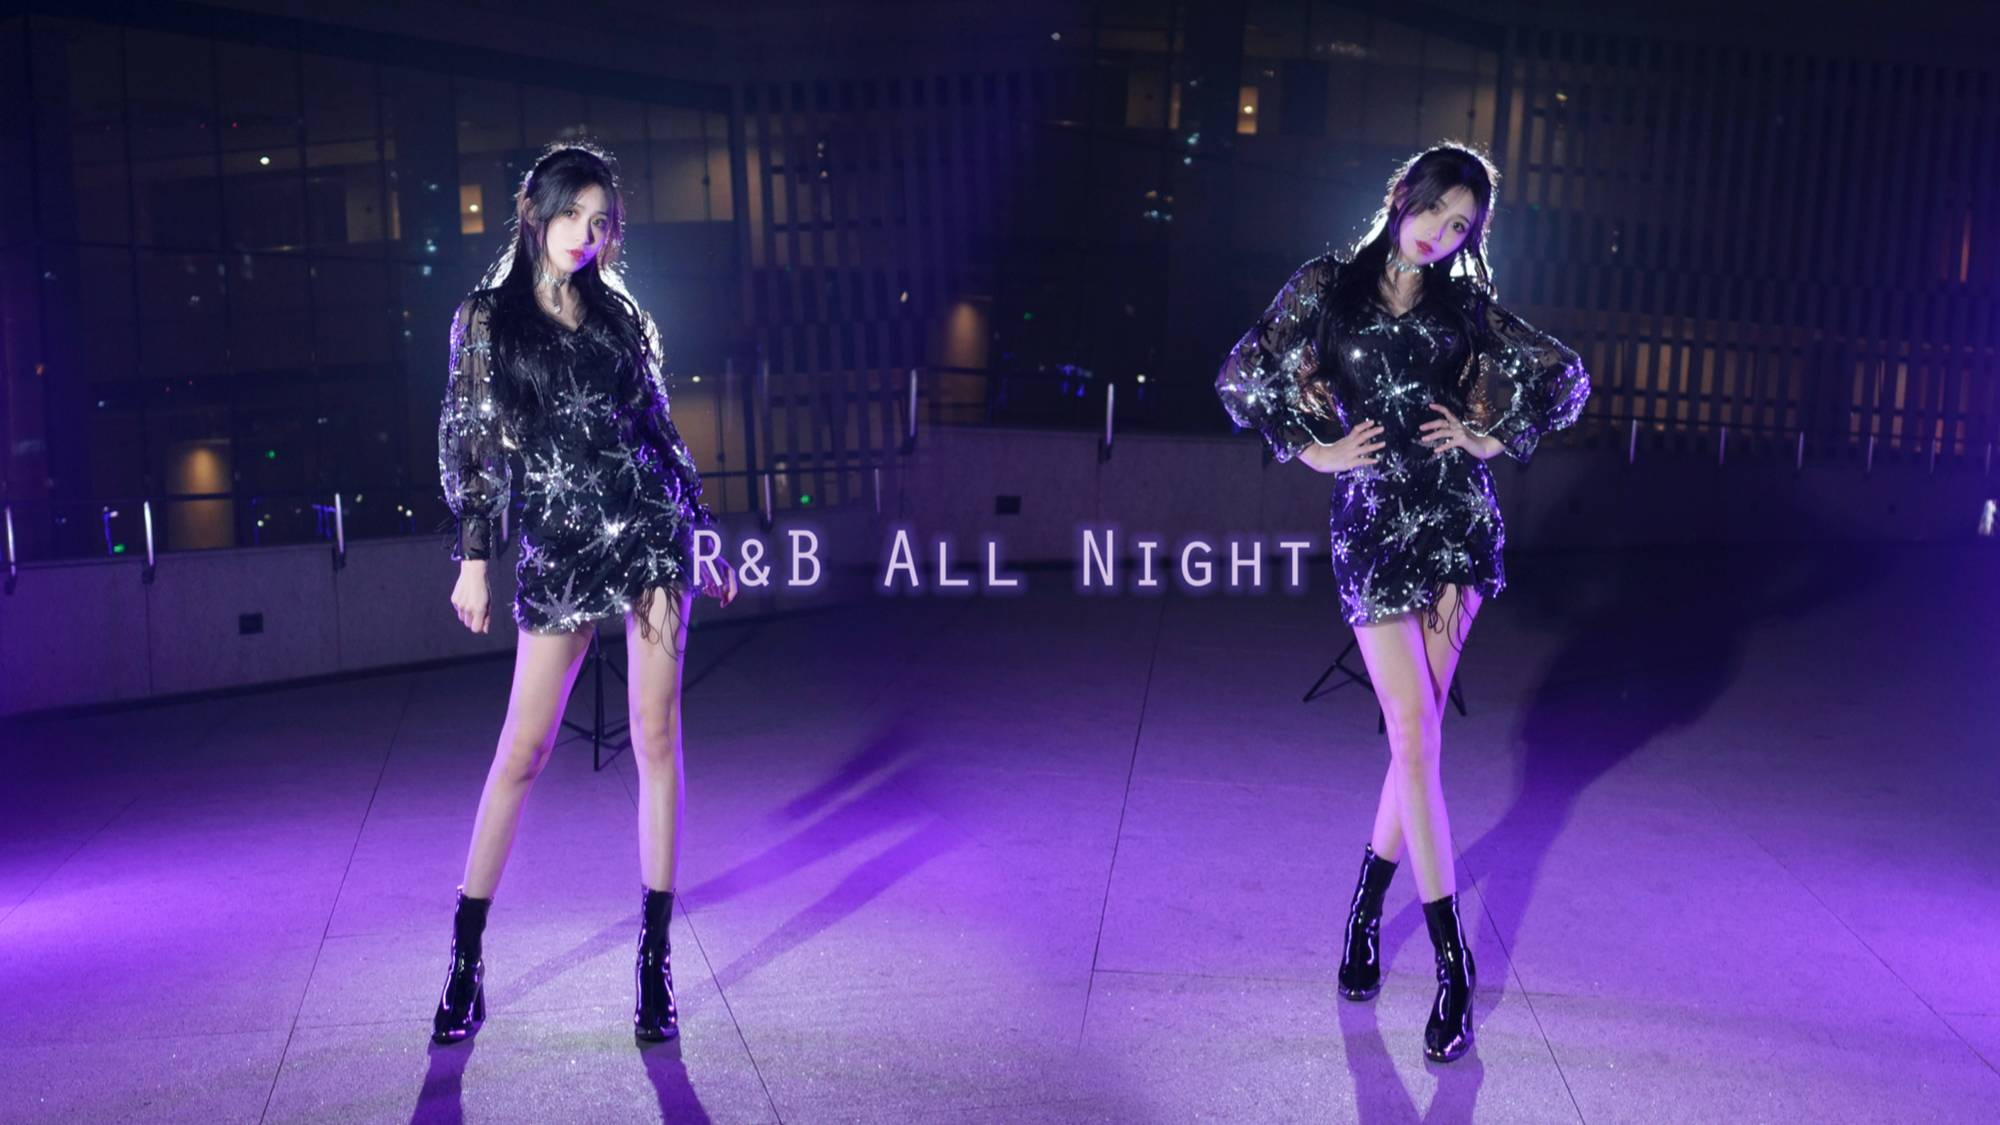 【JacQwist】午夜场限定!R&B All Night